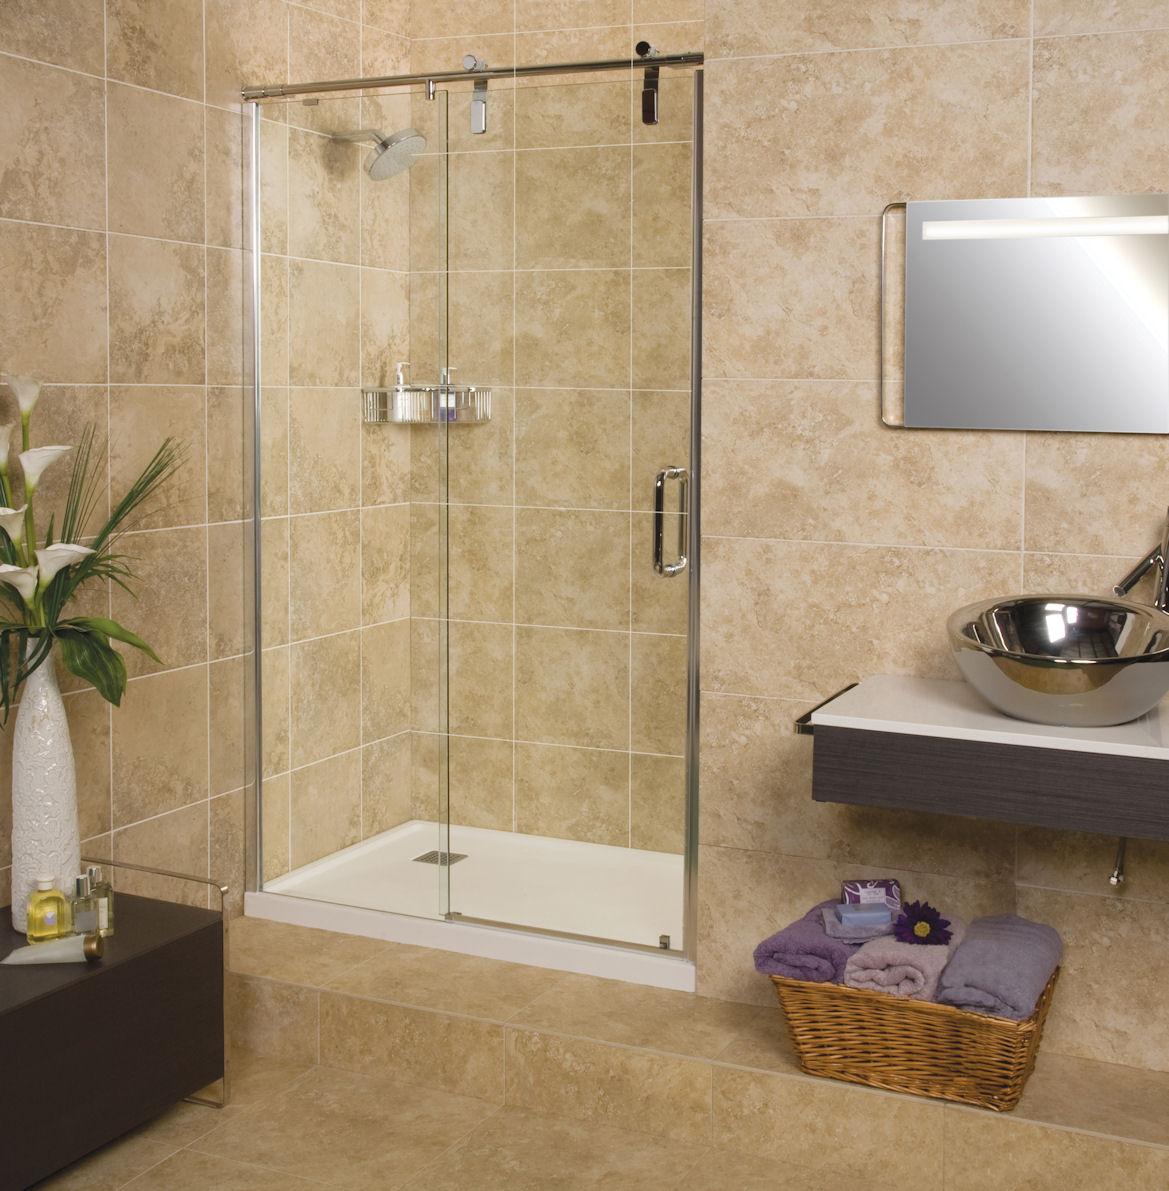 Roman Decemx Sliding Shower Door 1200mm Alcove Fitting